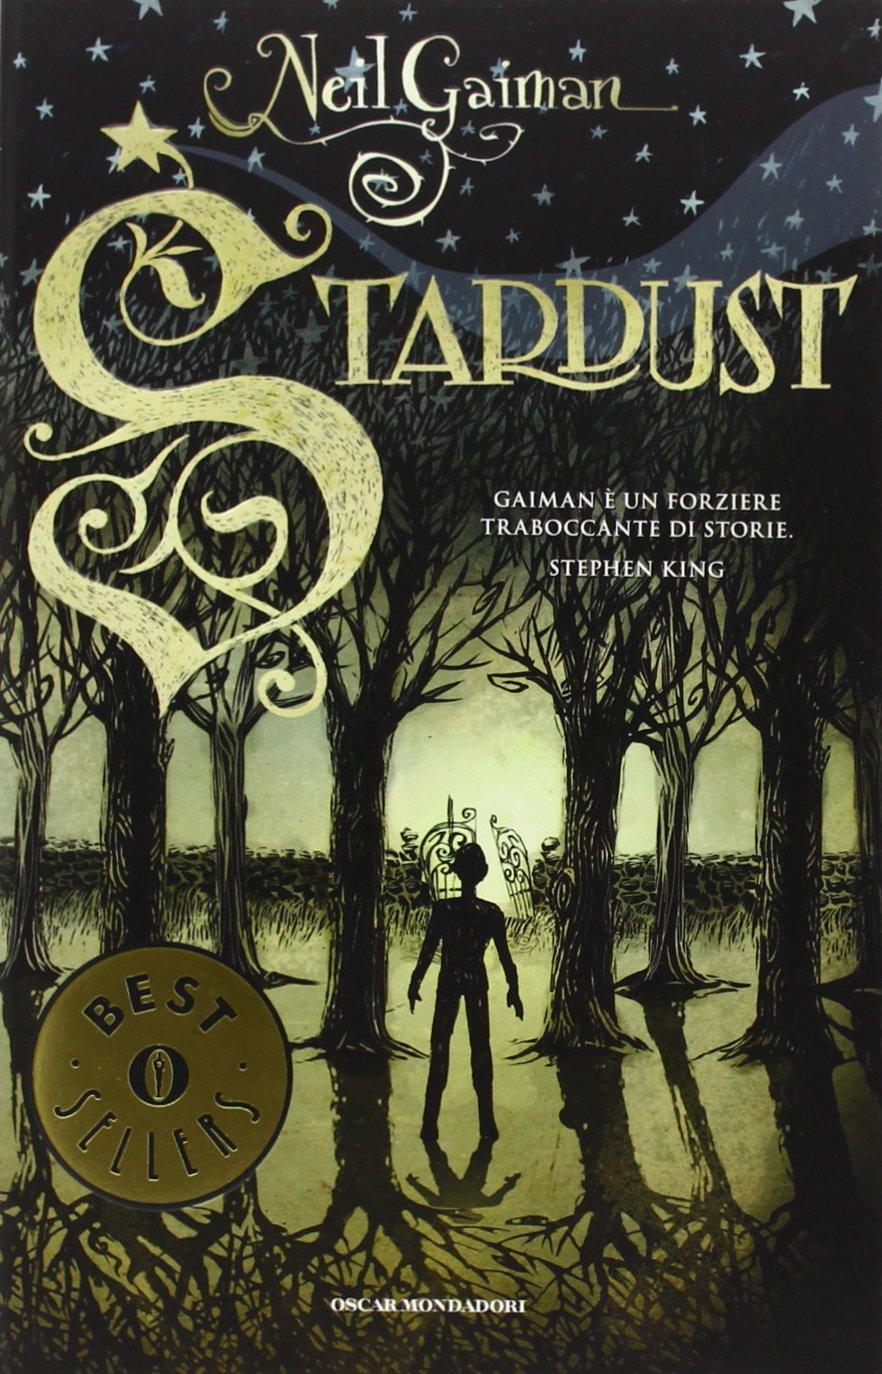 Stardust: Amazon.it: Gaiman, Neil, Bartocci, M.: Libri